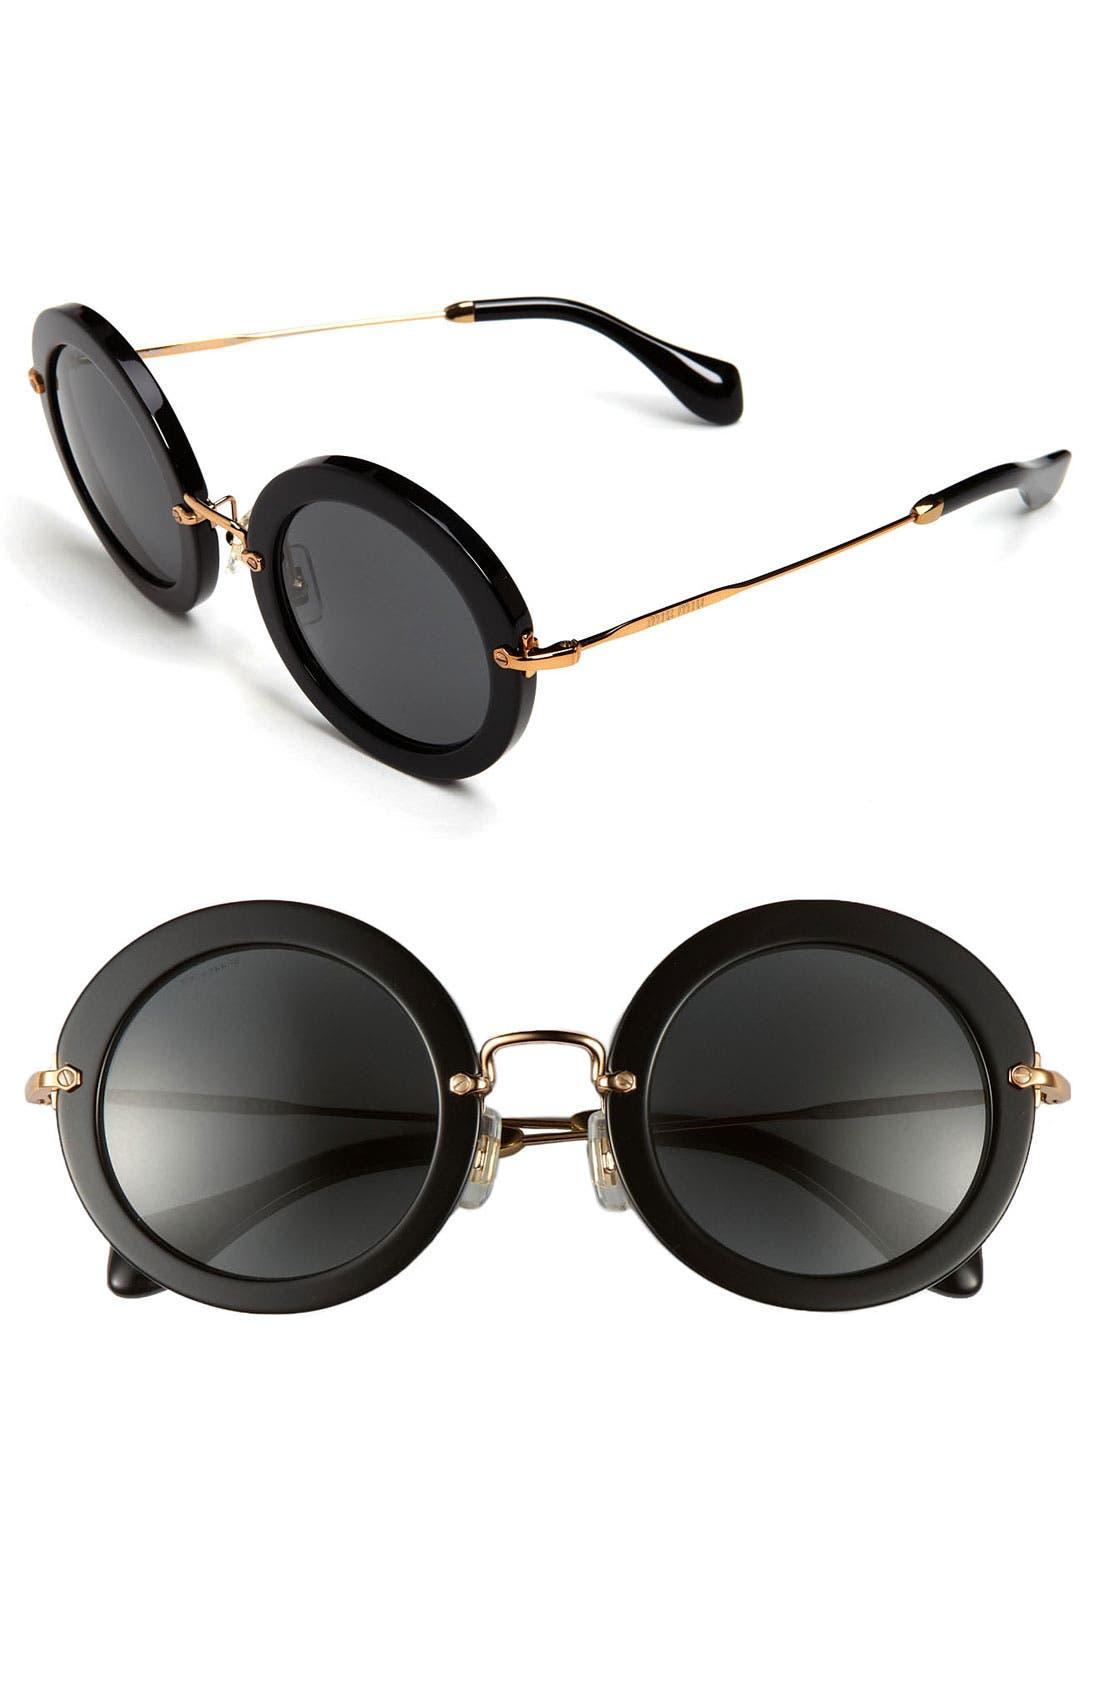 49mm Round Retro Sunglasses,                             Main thumbnail 1, color,                             001